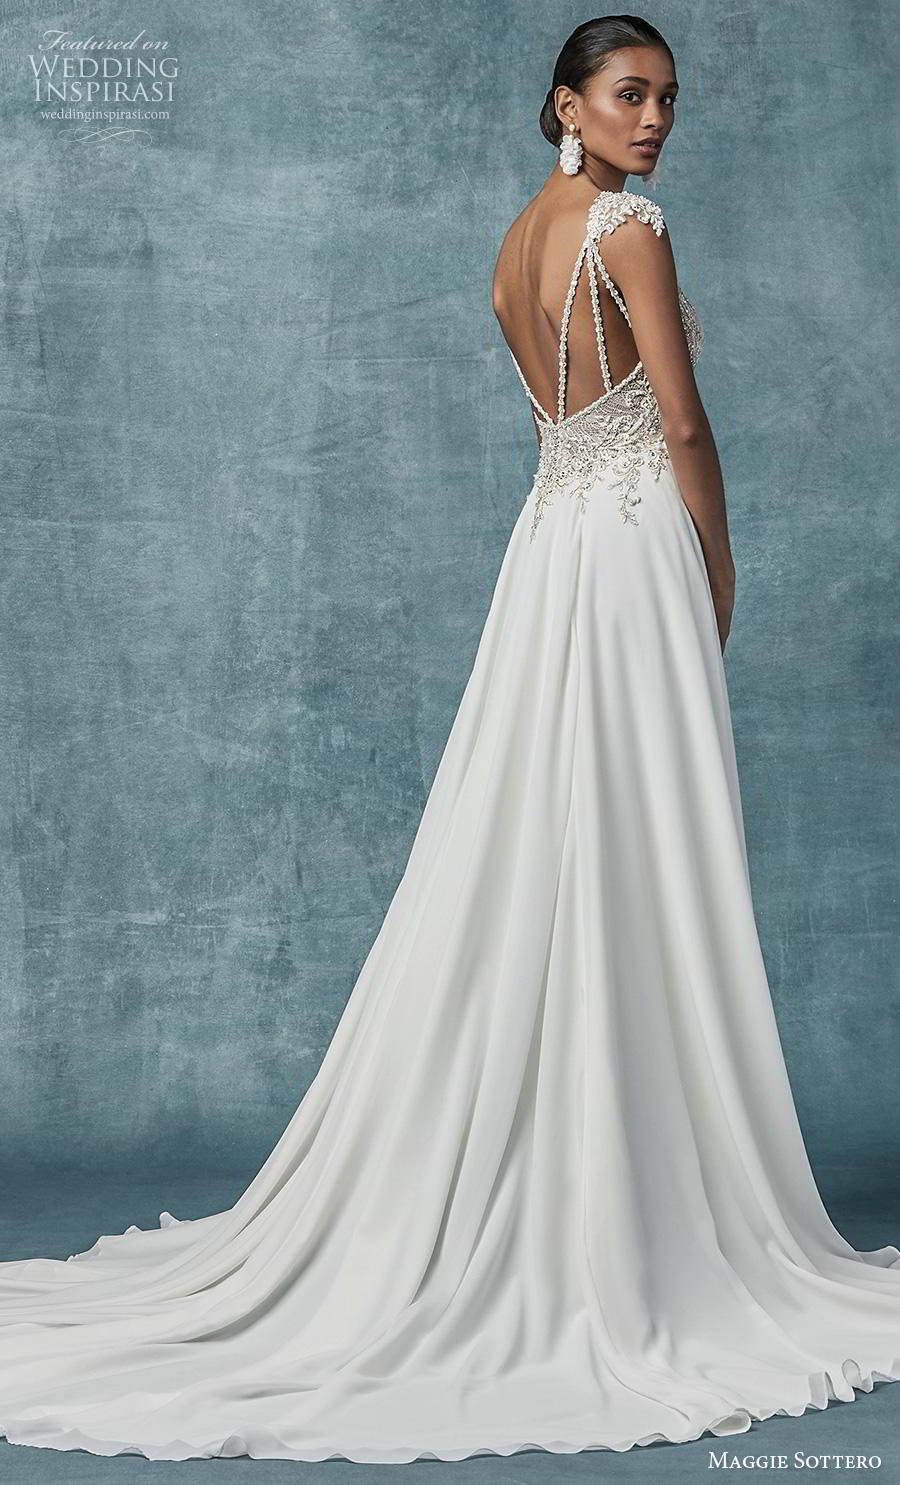 maggie sottero spring 2019 bridal cap sleeves deep v neck heavily embellished bodice glitzy elegant soft a  line wedding dress backless chapel train (4) bv